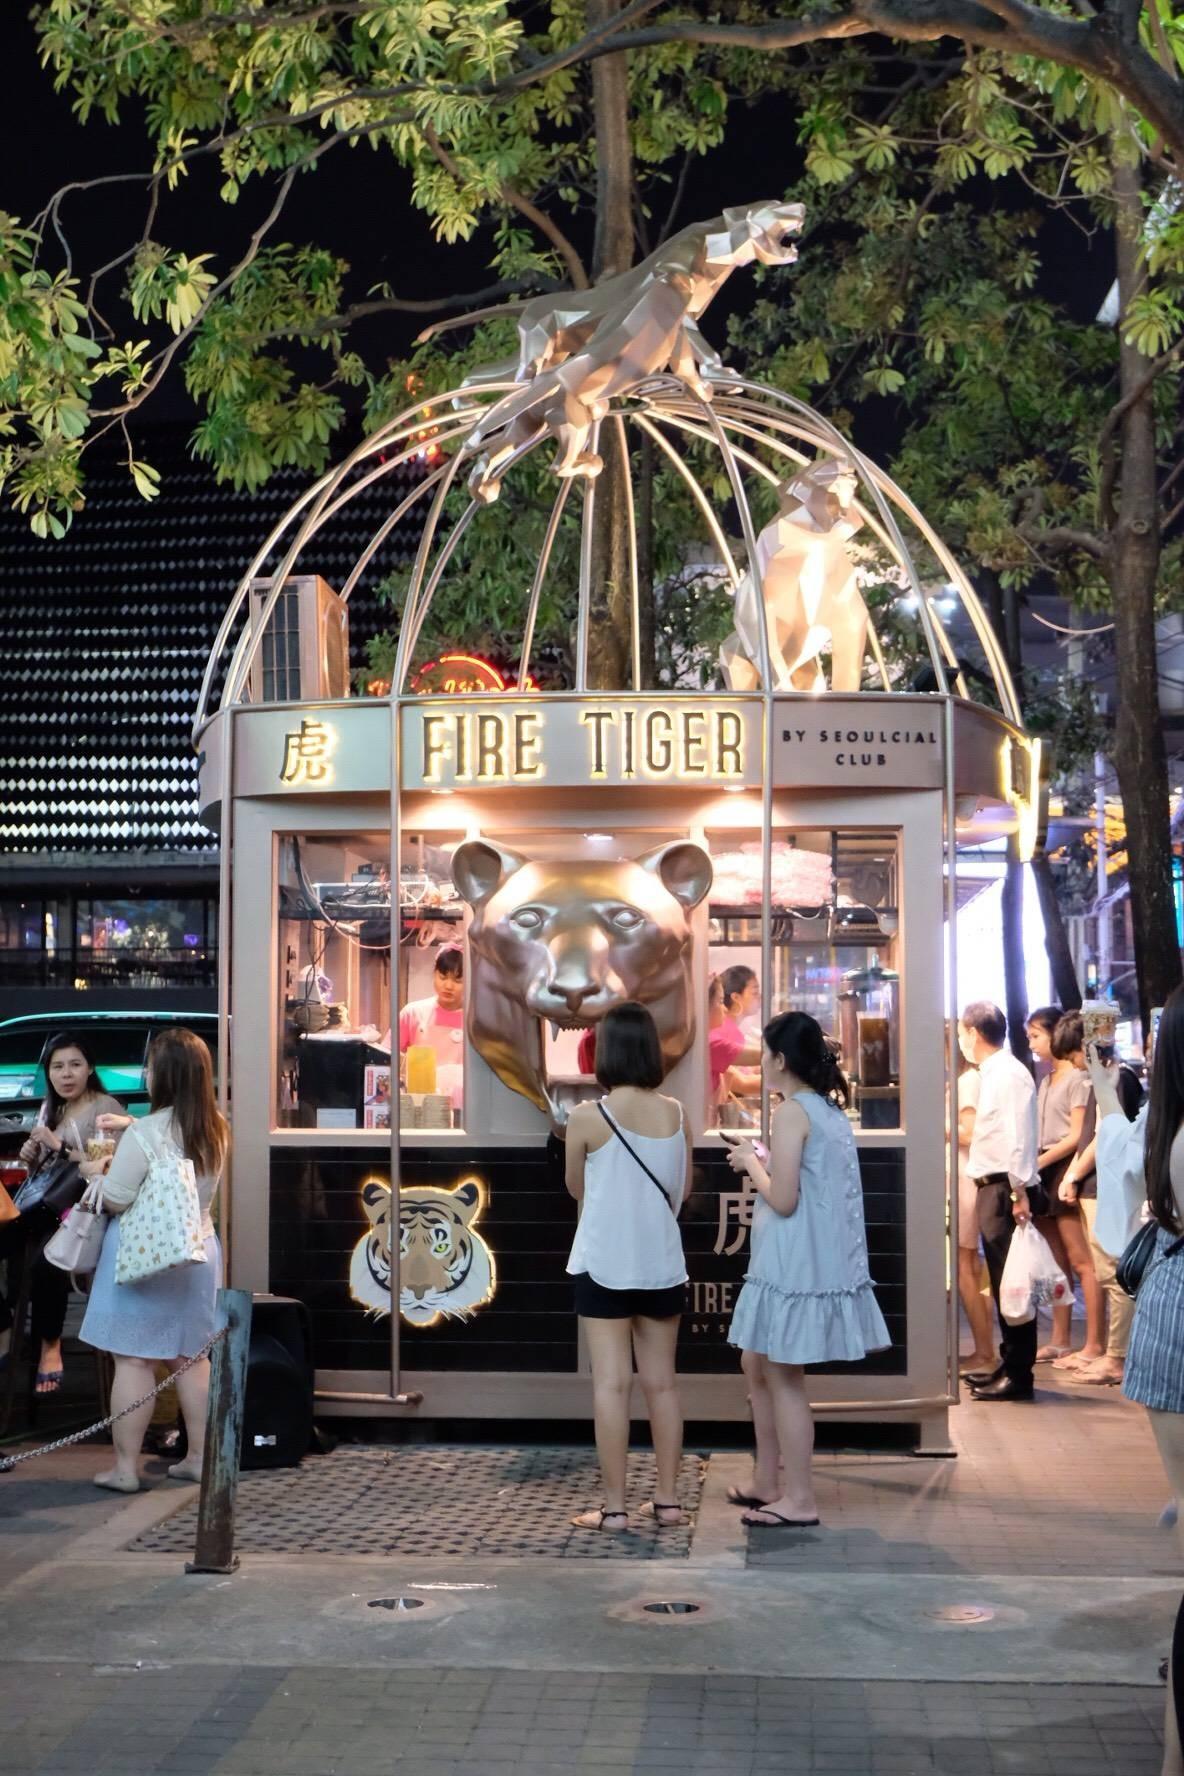 Fire Tiger By Seoulcial Club สยามสแควร์ ซอย7 Fire Tiger By Seoulcial Club สยามสแควร์ ซอย7